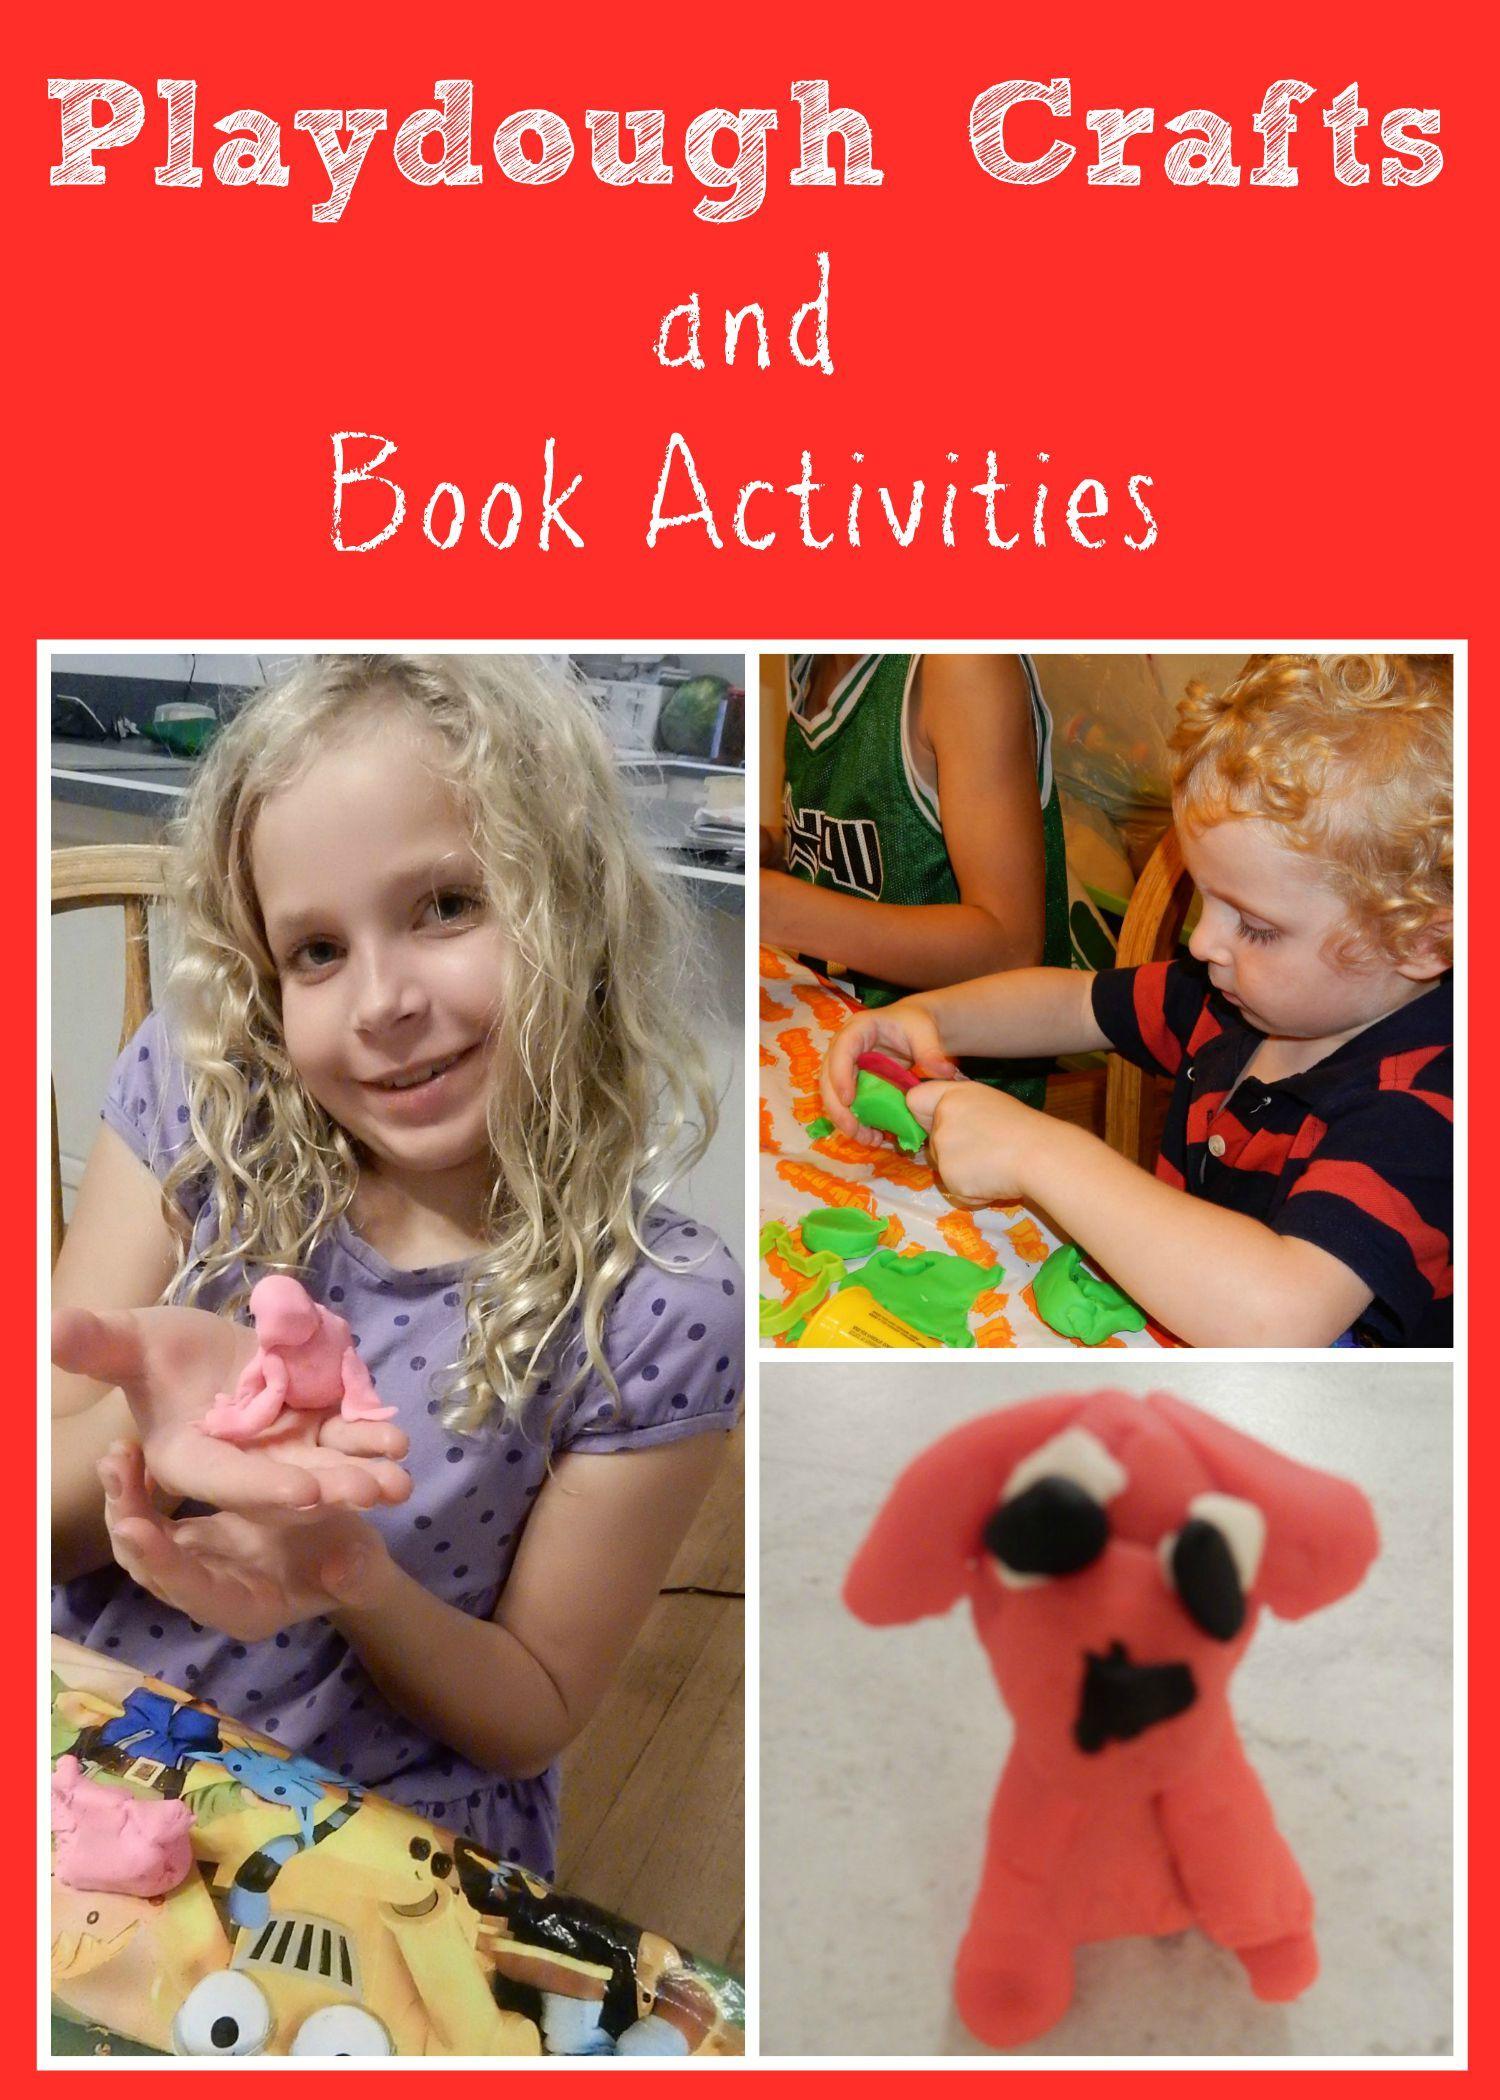 Playdough Crafts And Book Activities Hands On Crafty Fun